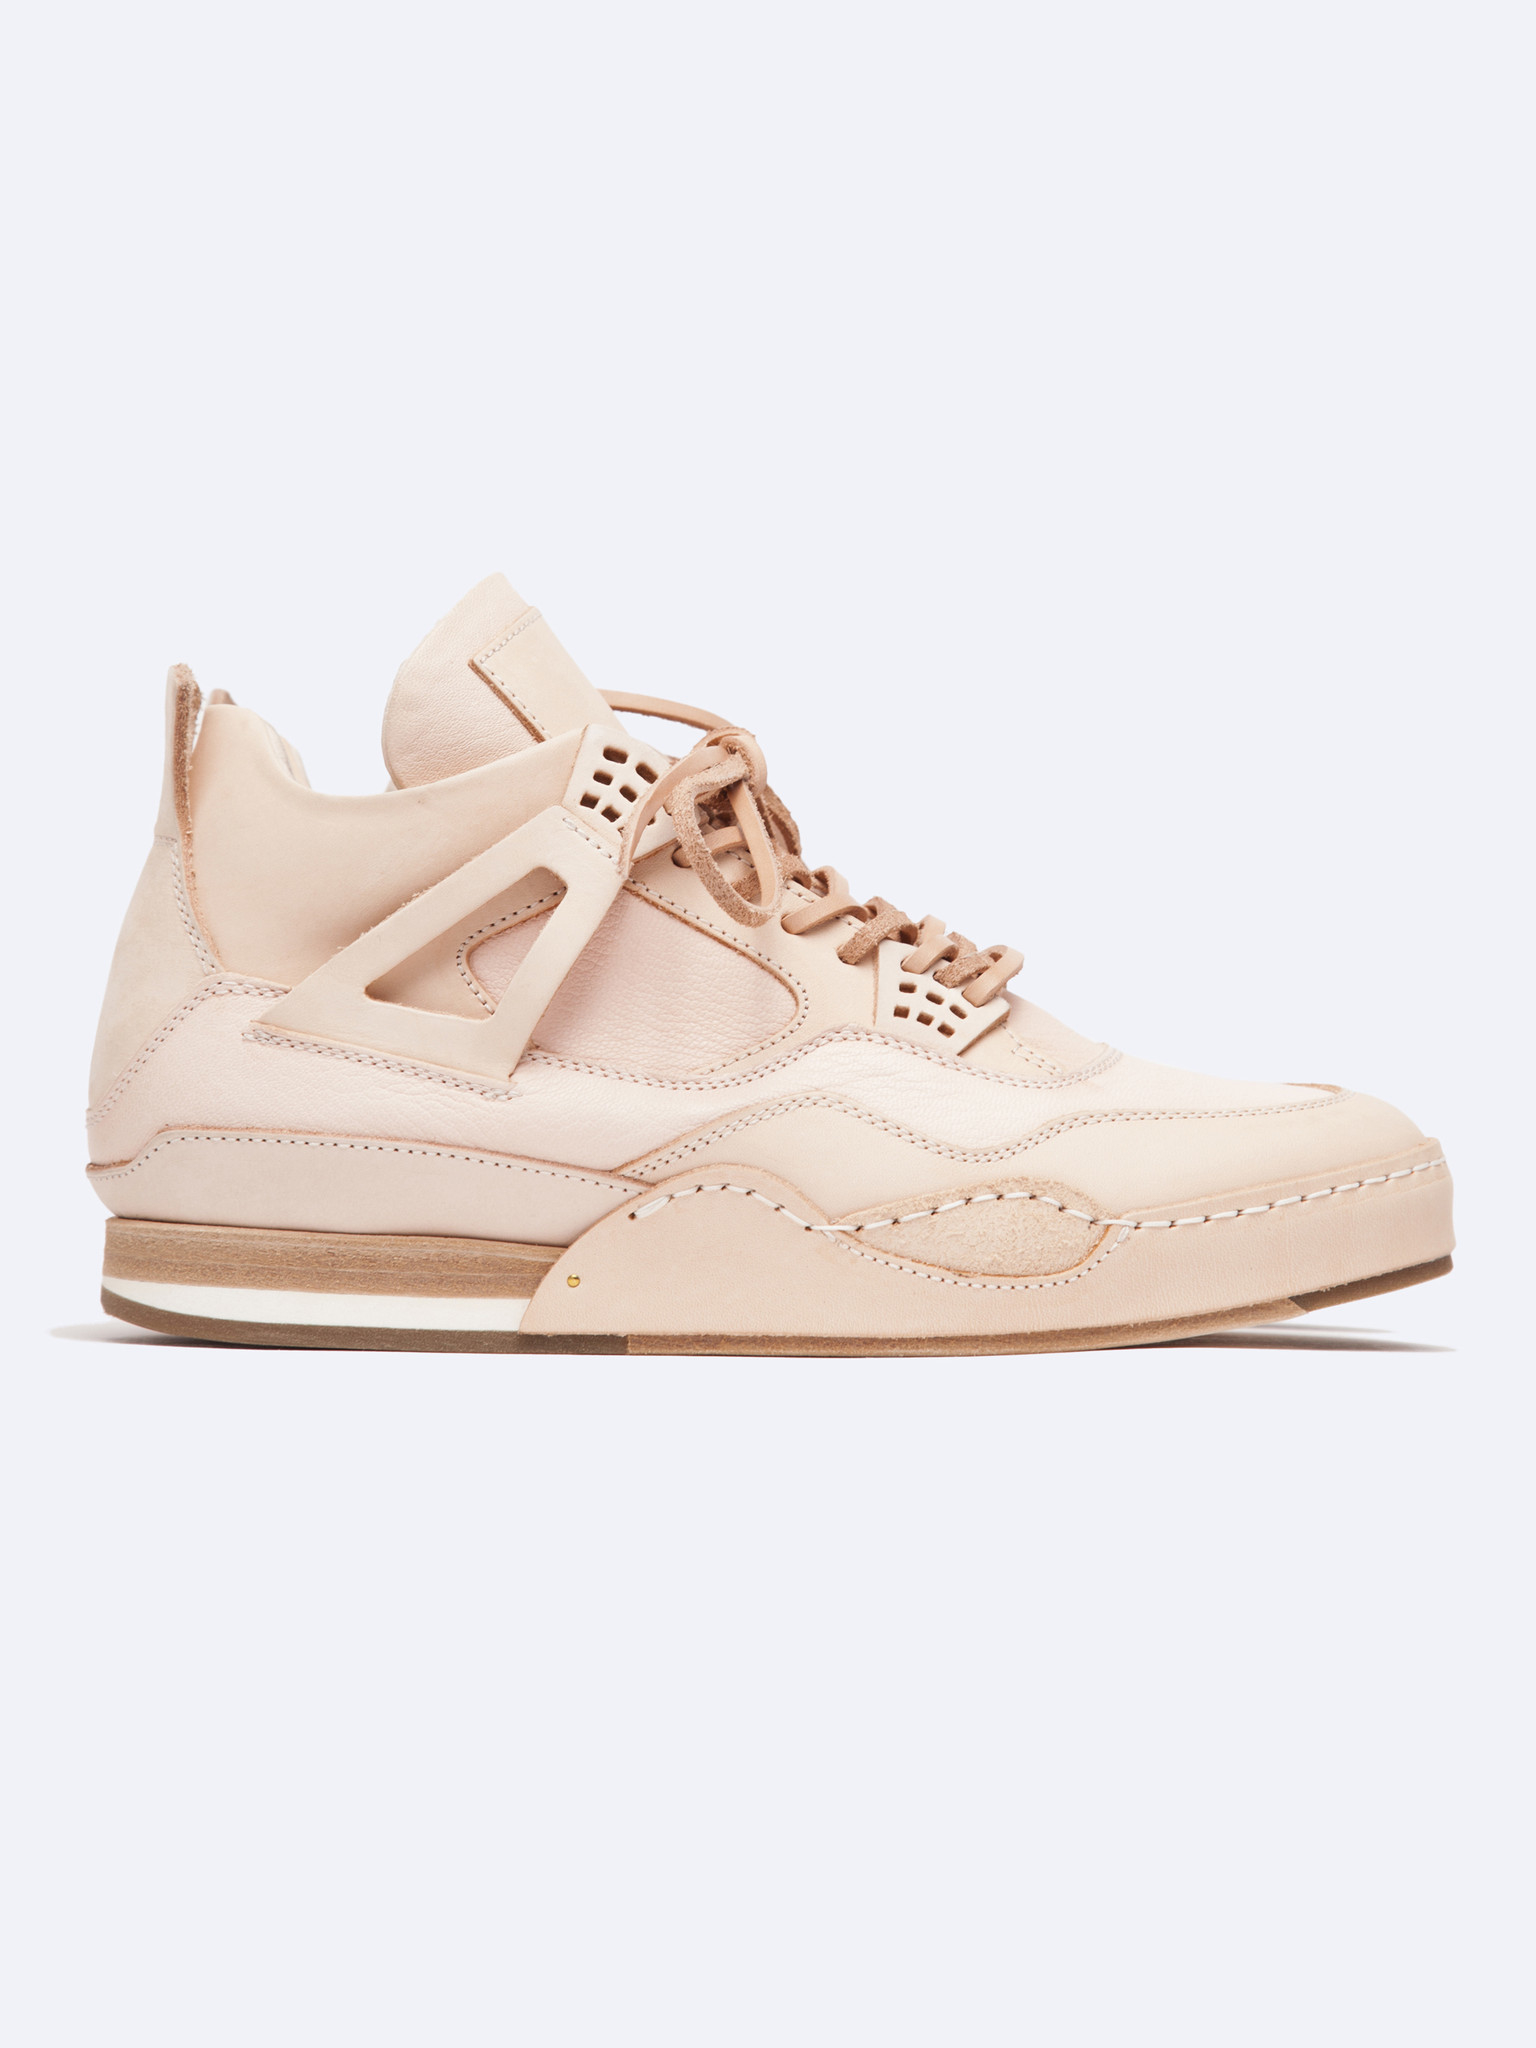 Beige Manual Industrial Products 02 Sneakers HENDER SCHEME NMiDDl5